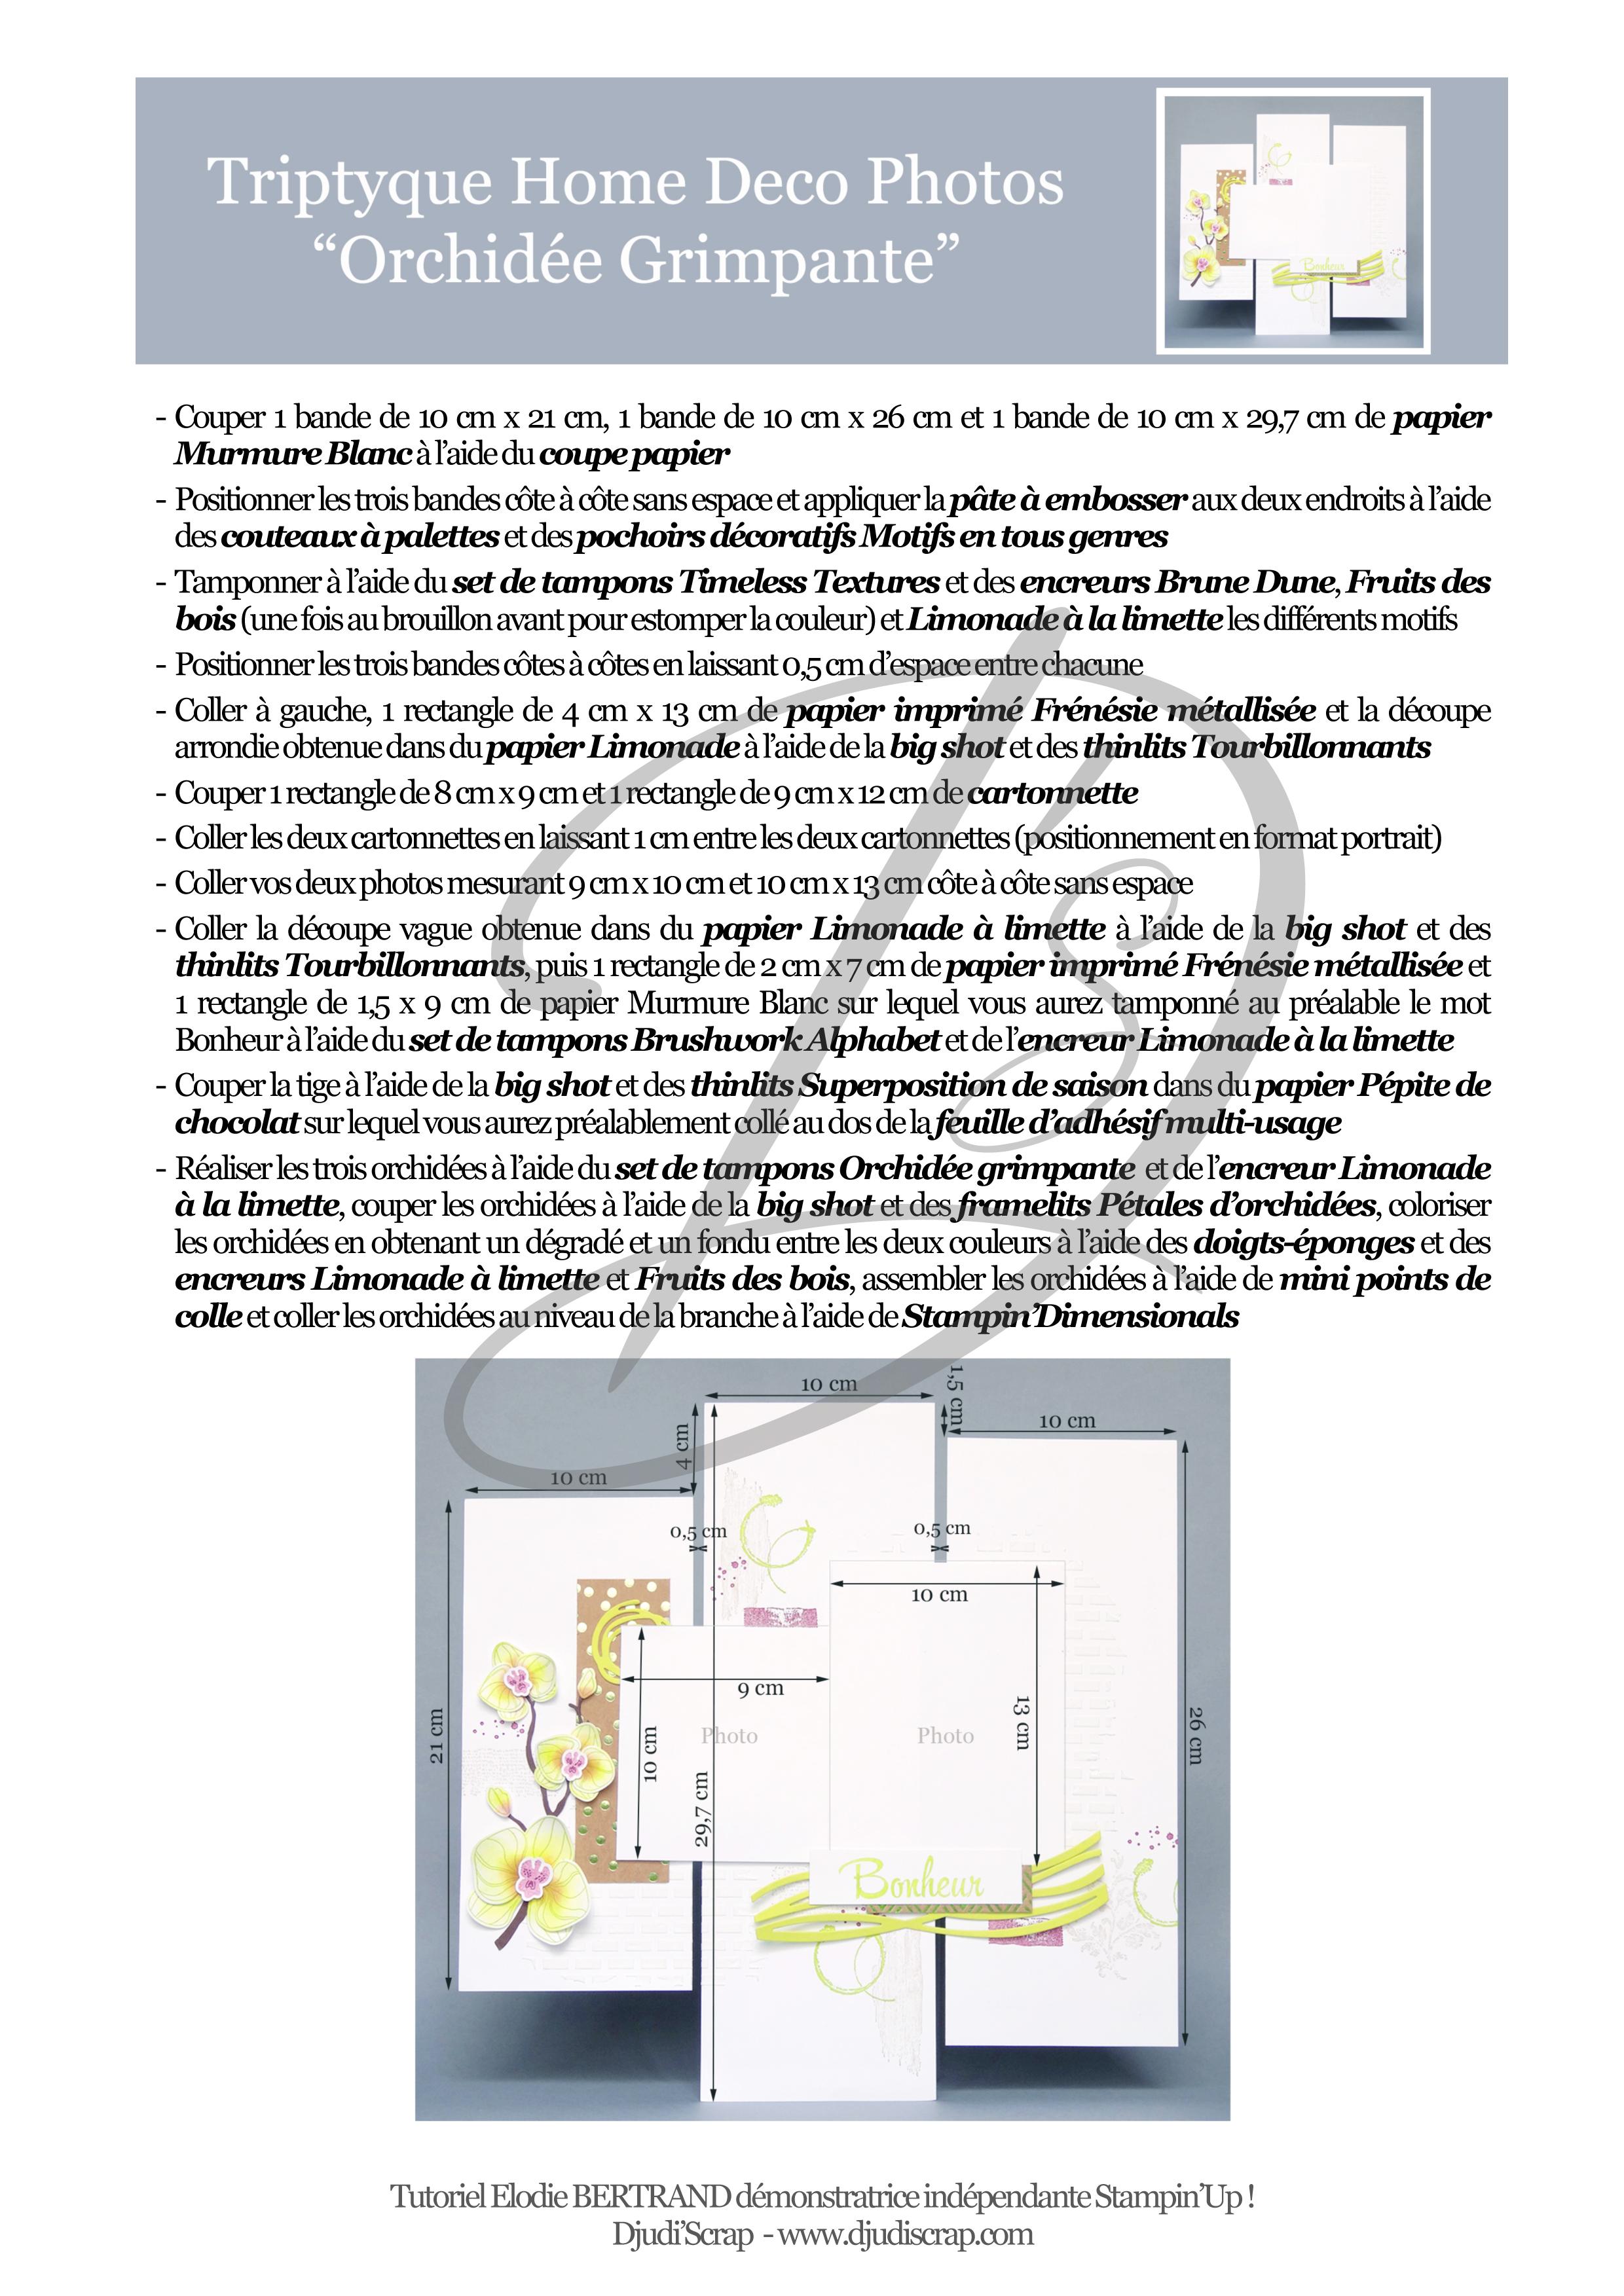 Microsoft Word - Triptyque Home Deco Photos 1.doc